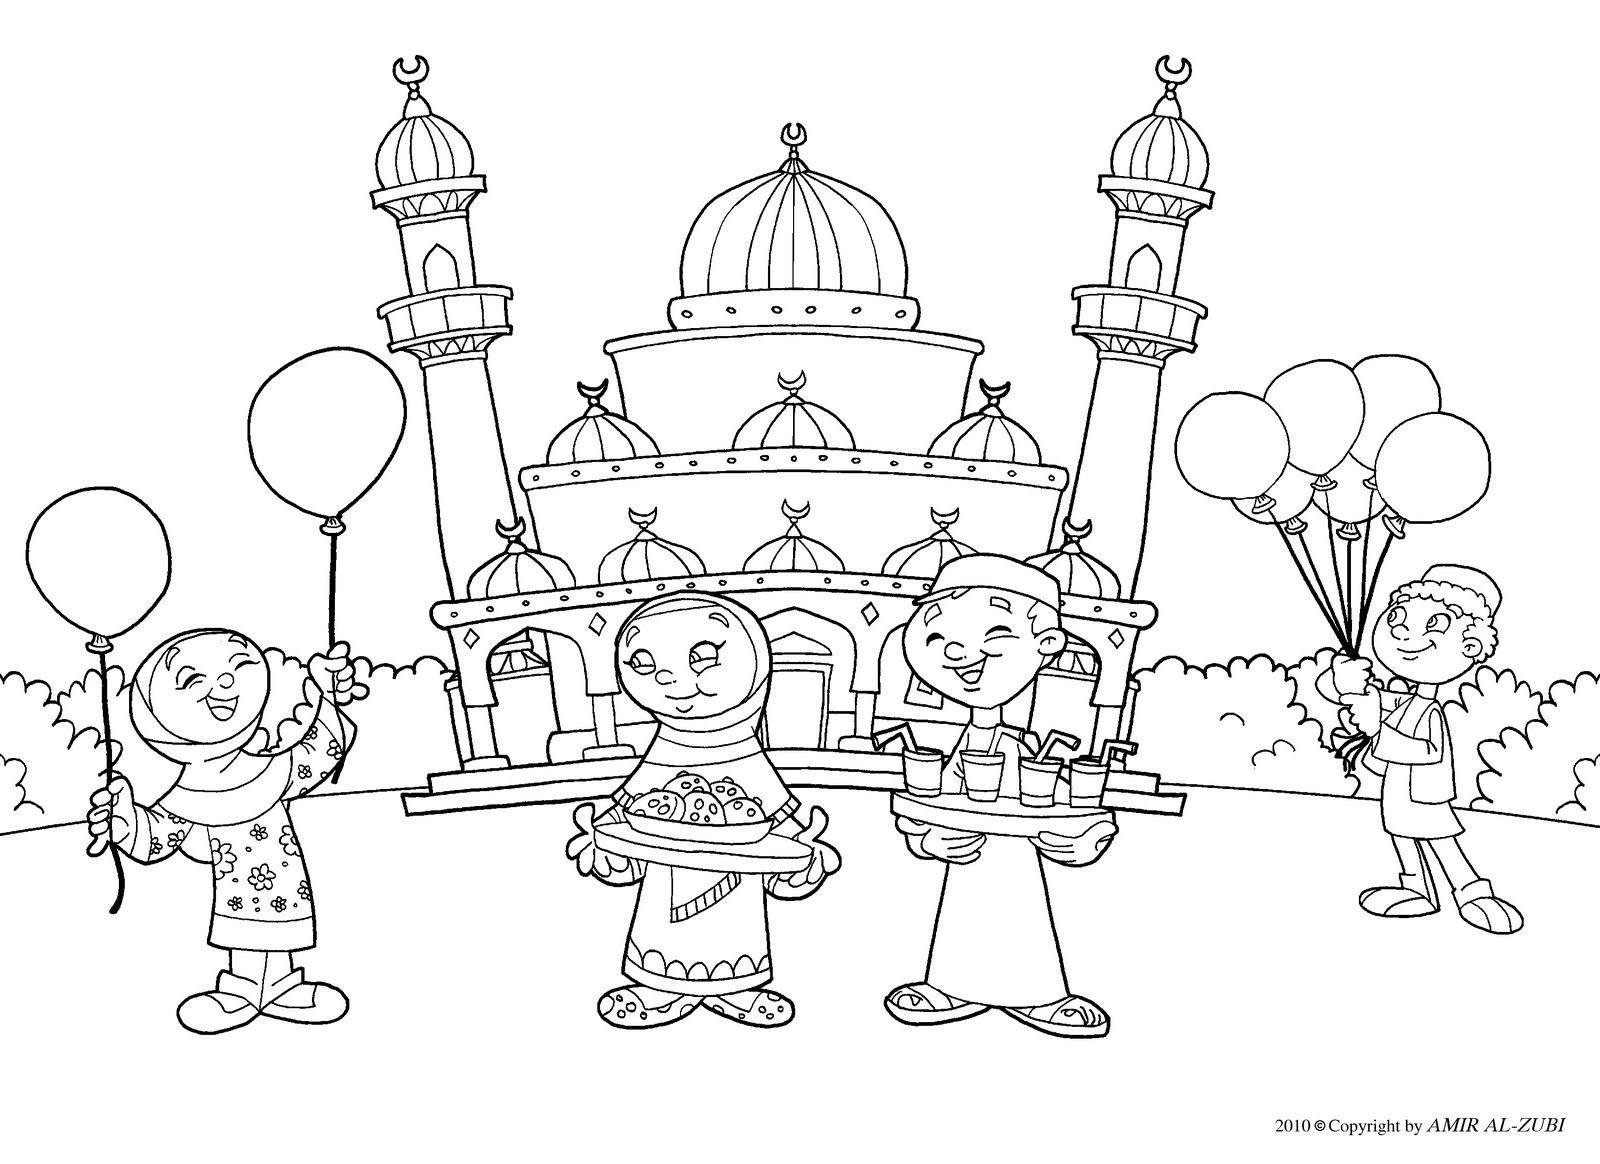 Jawaher kids&Nis¢a صور إسلامية لتلوين لصغار، تلوين متعة و تسلية للأطفال